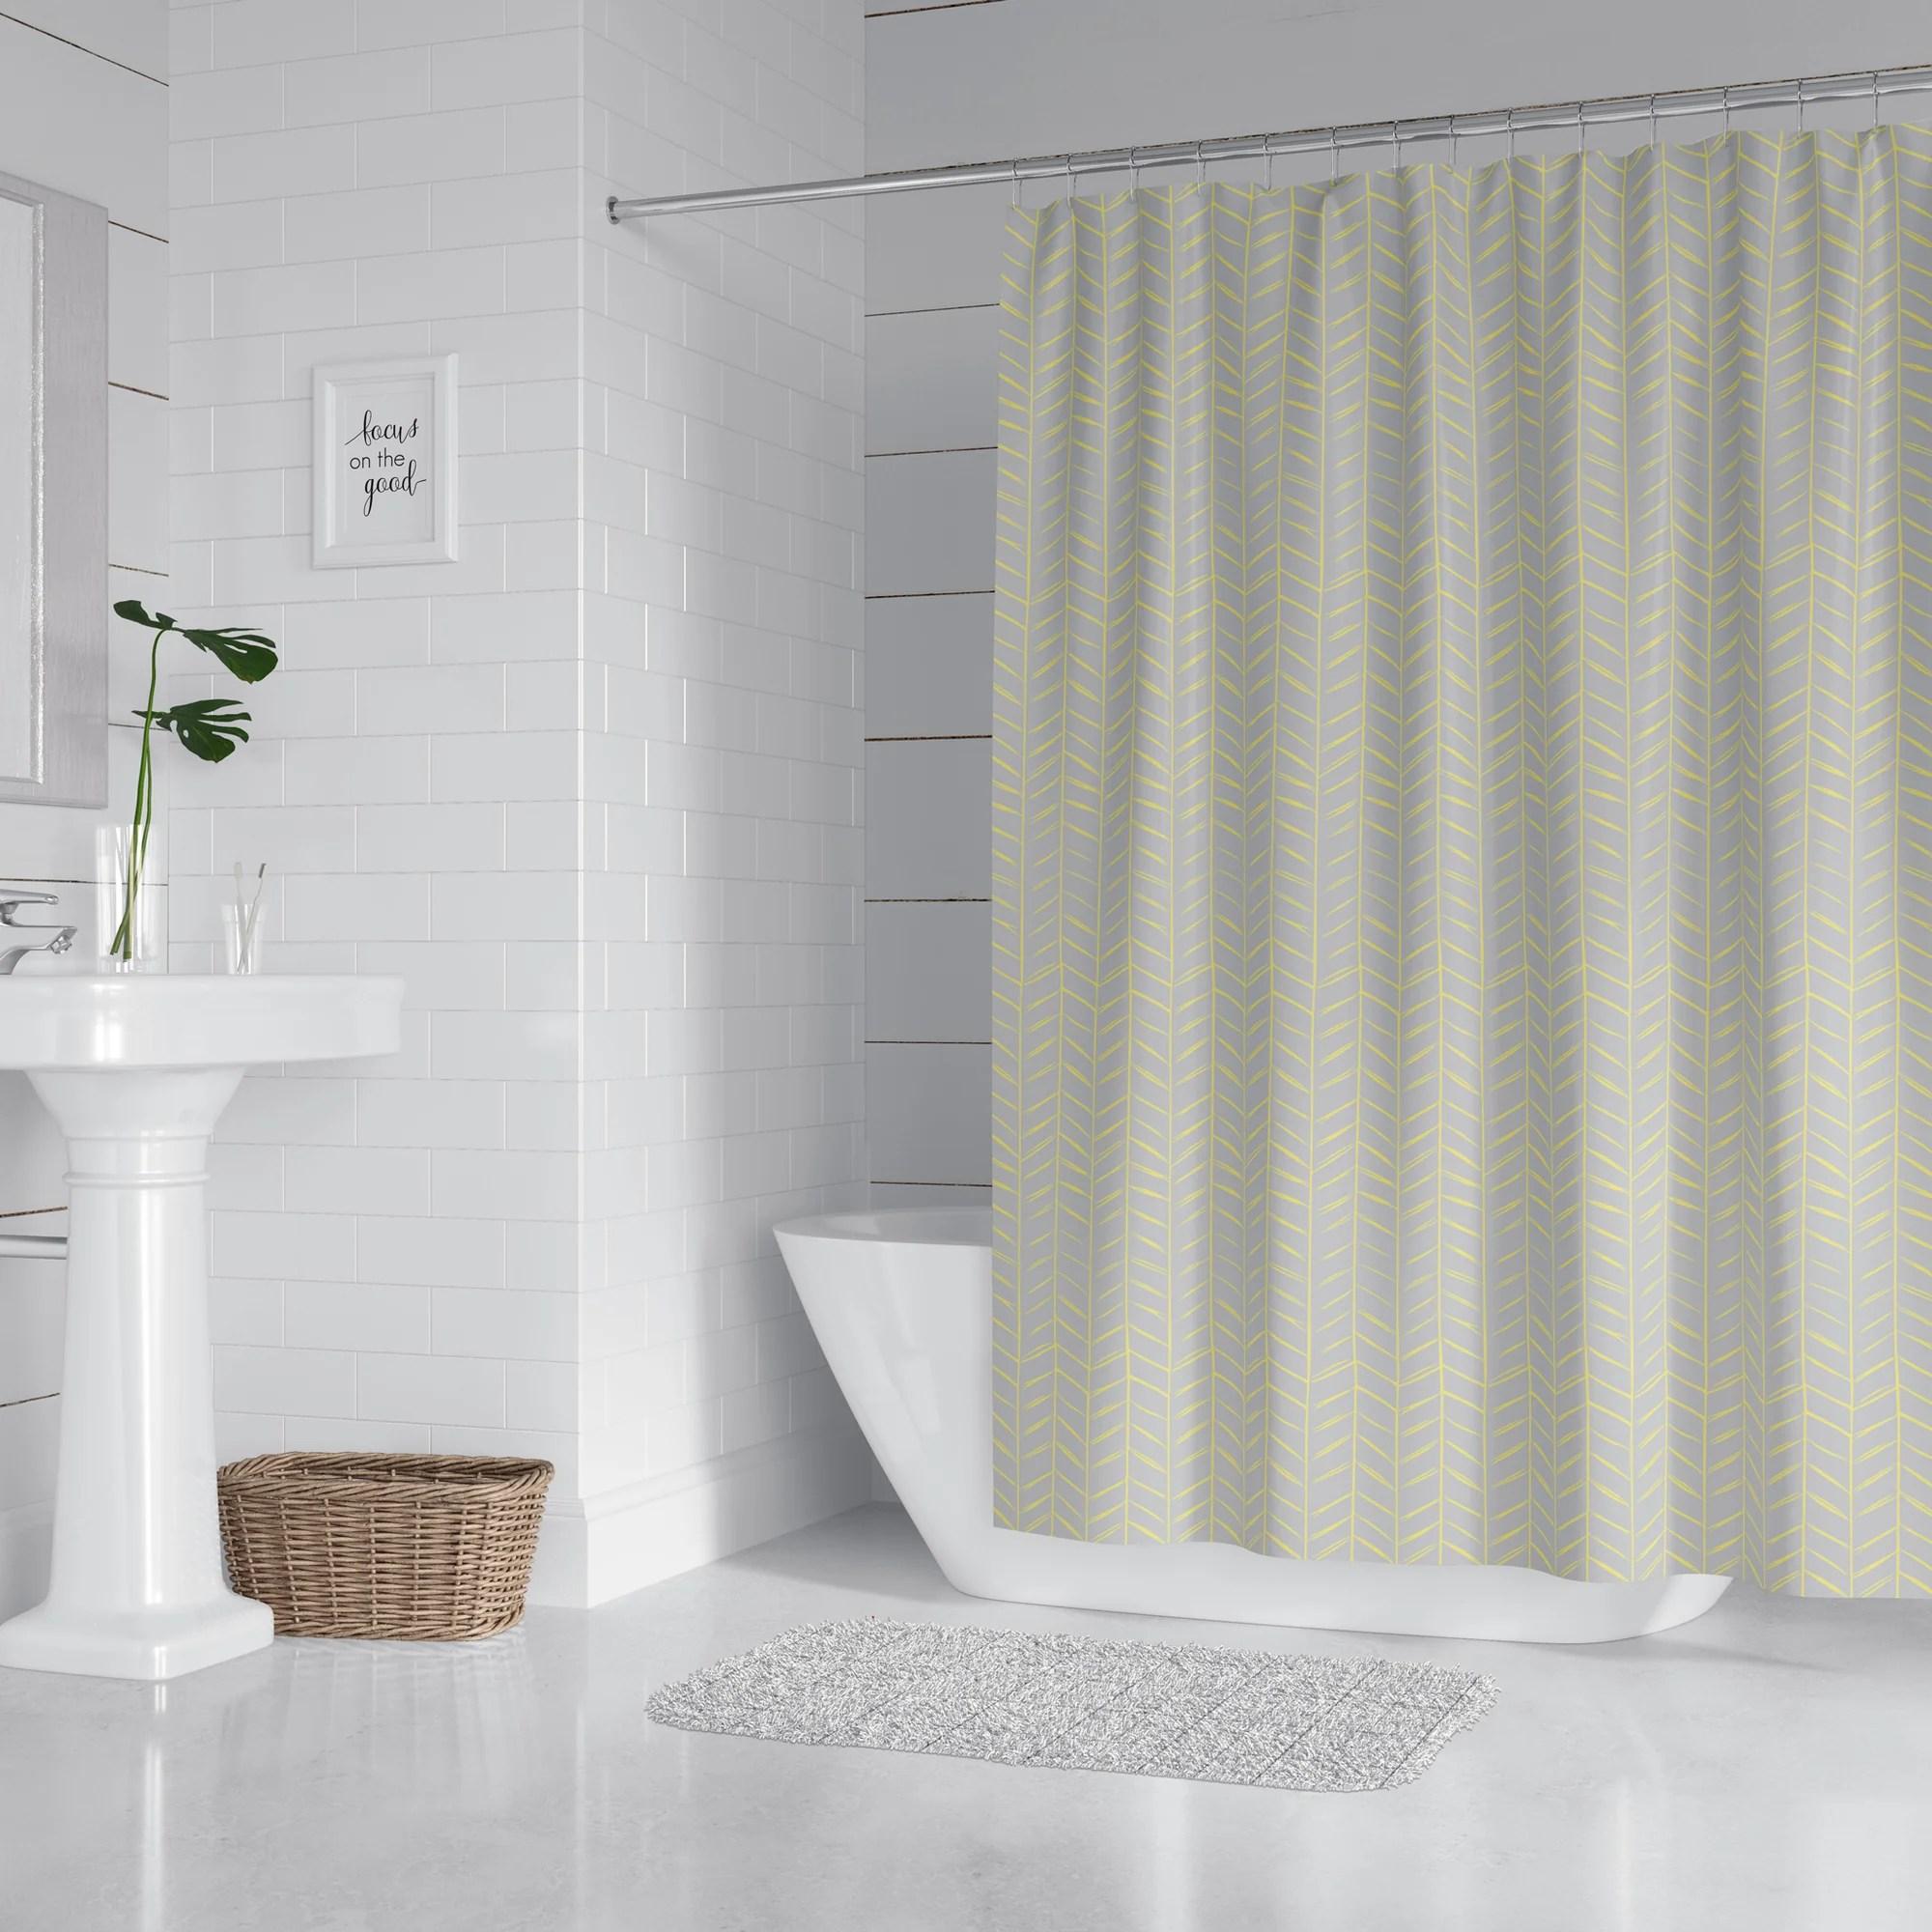 peach shower curtains decor made custom